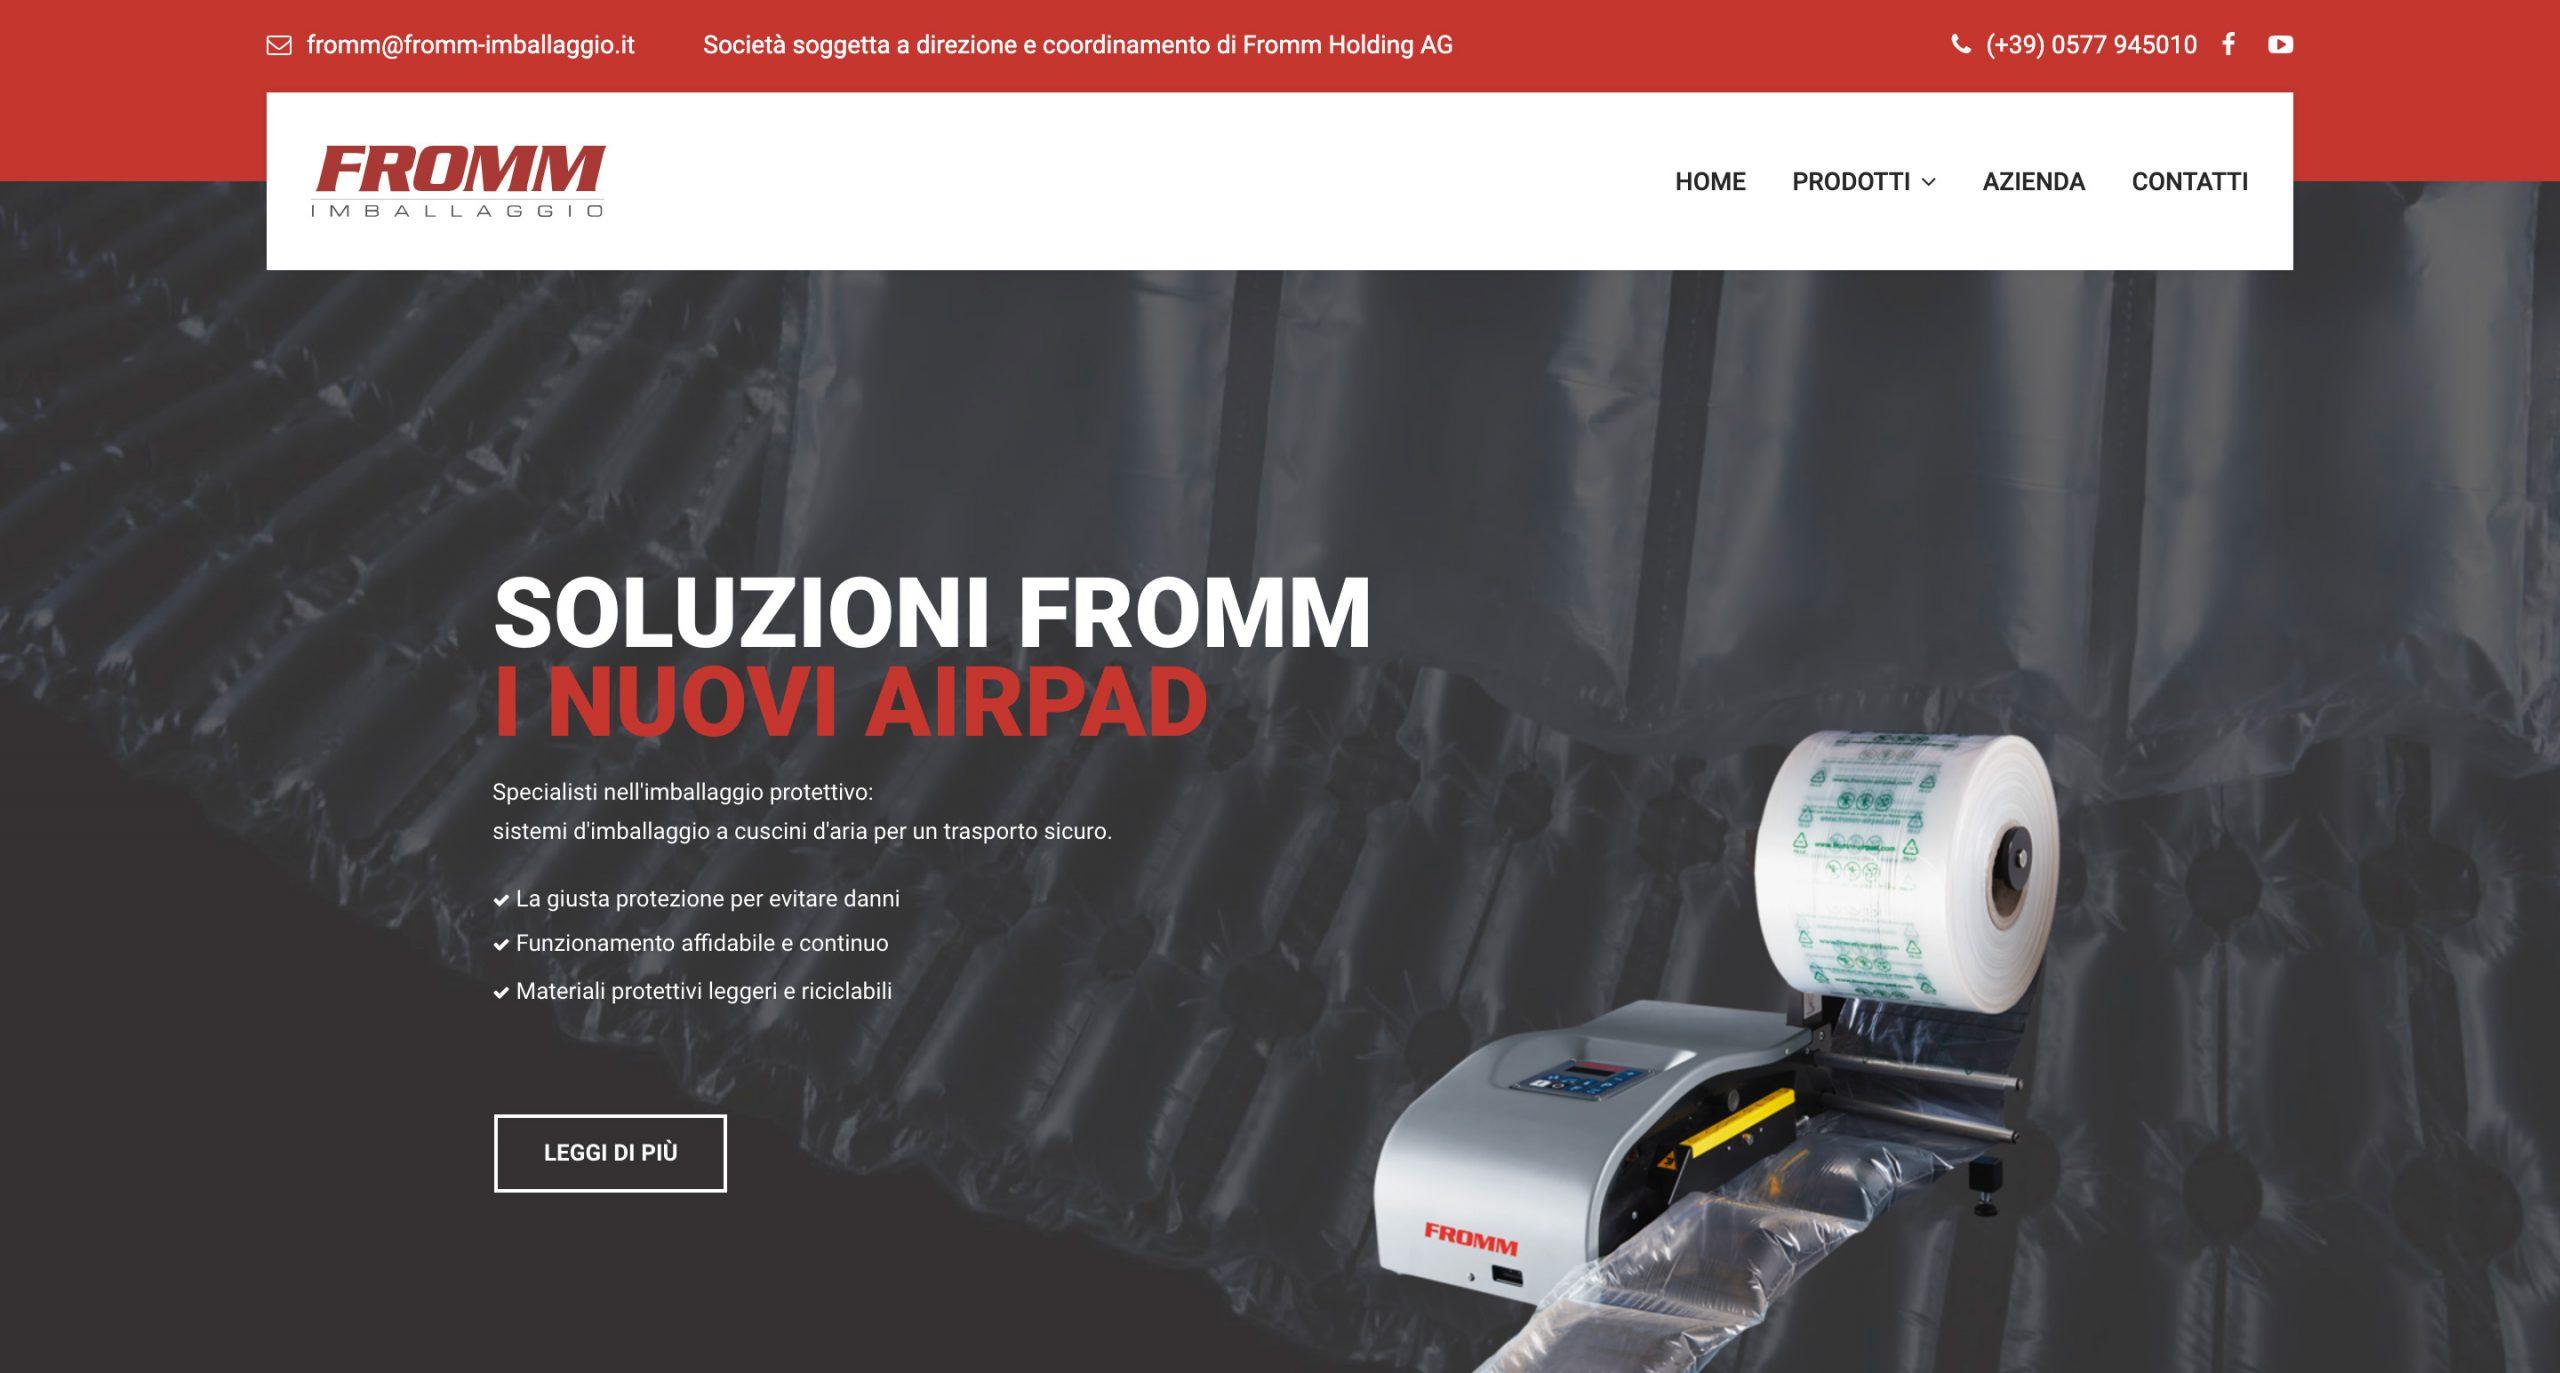 wowcreatives-fromm-imballaggio-website-all